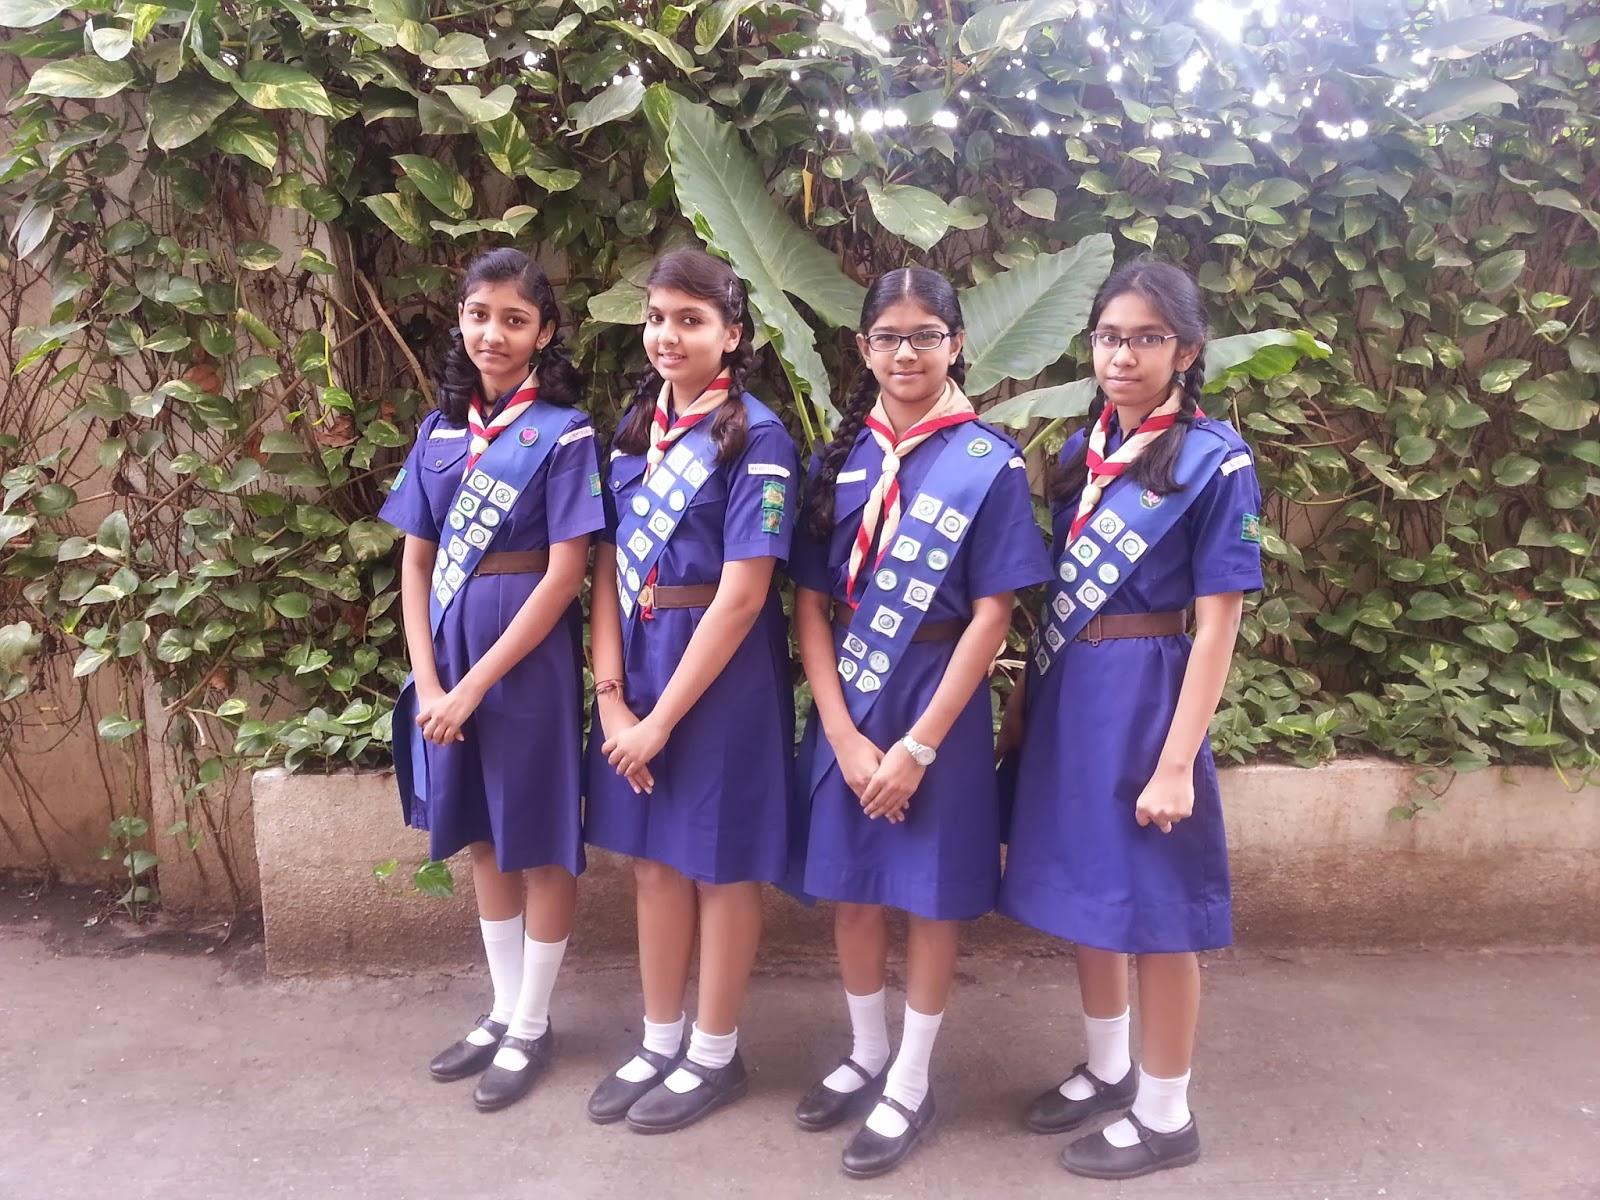 ris diaries rajyapuraskar exam scout n guide 7 jan 2014 to 10 jan rh rismumbai blogspot com Dress Guide and Scout Scout Guide and Details